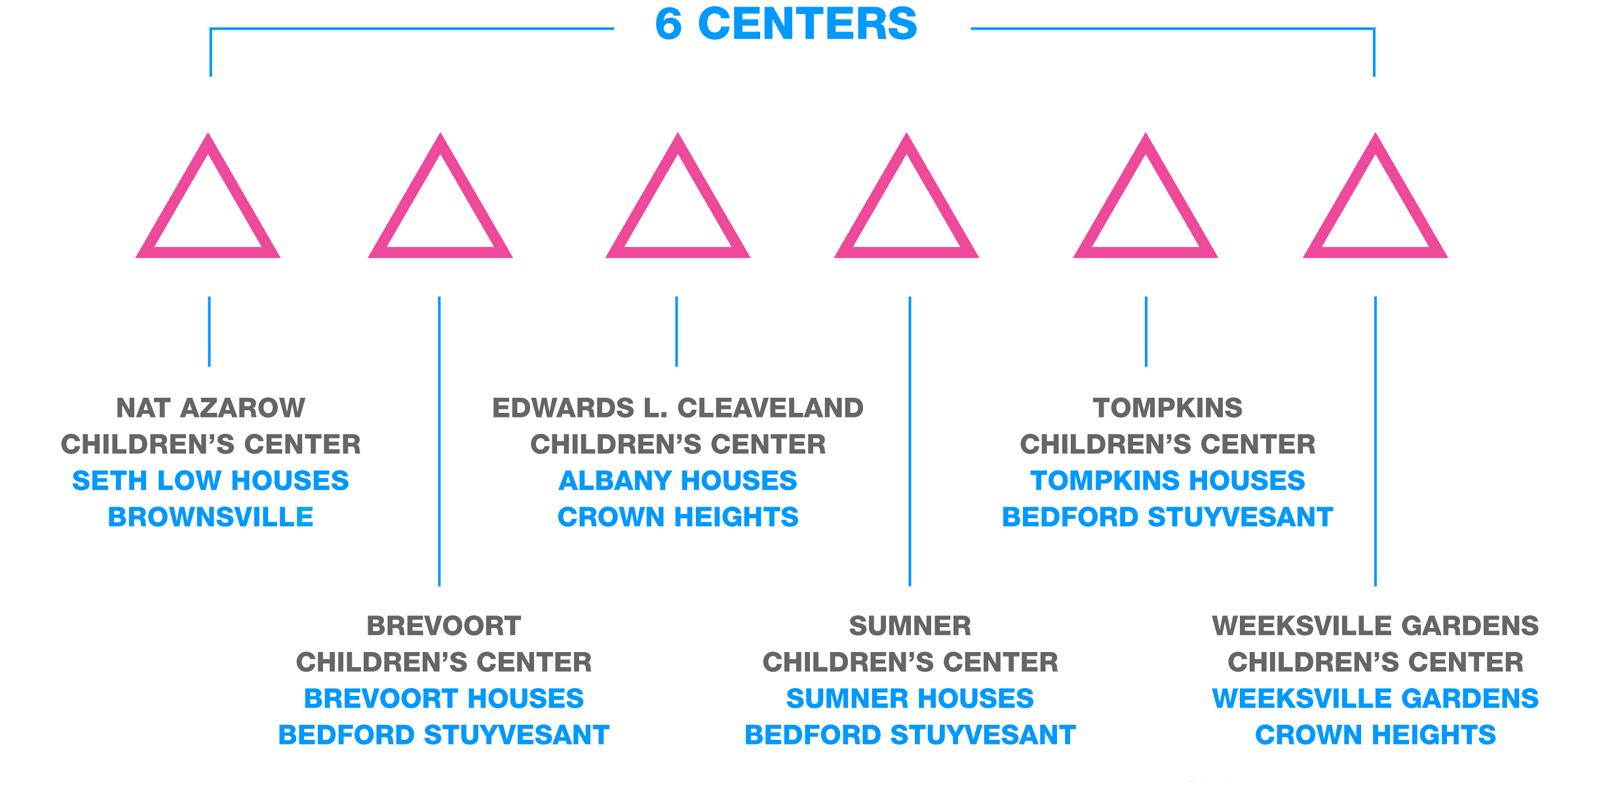 6-centers